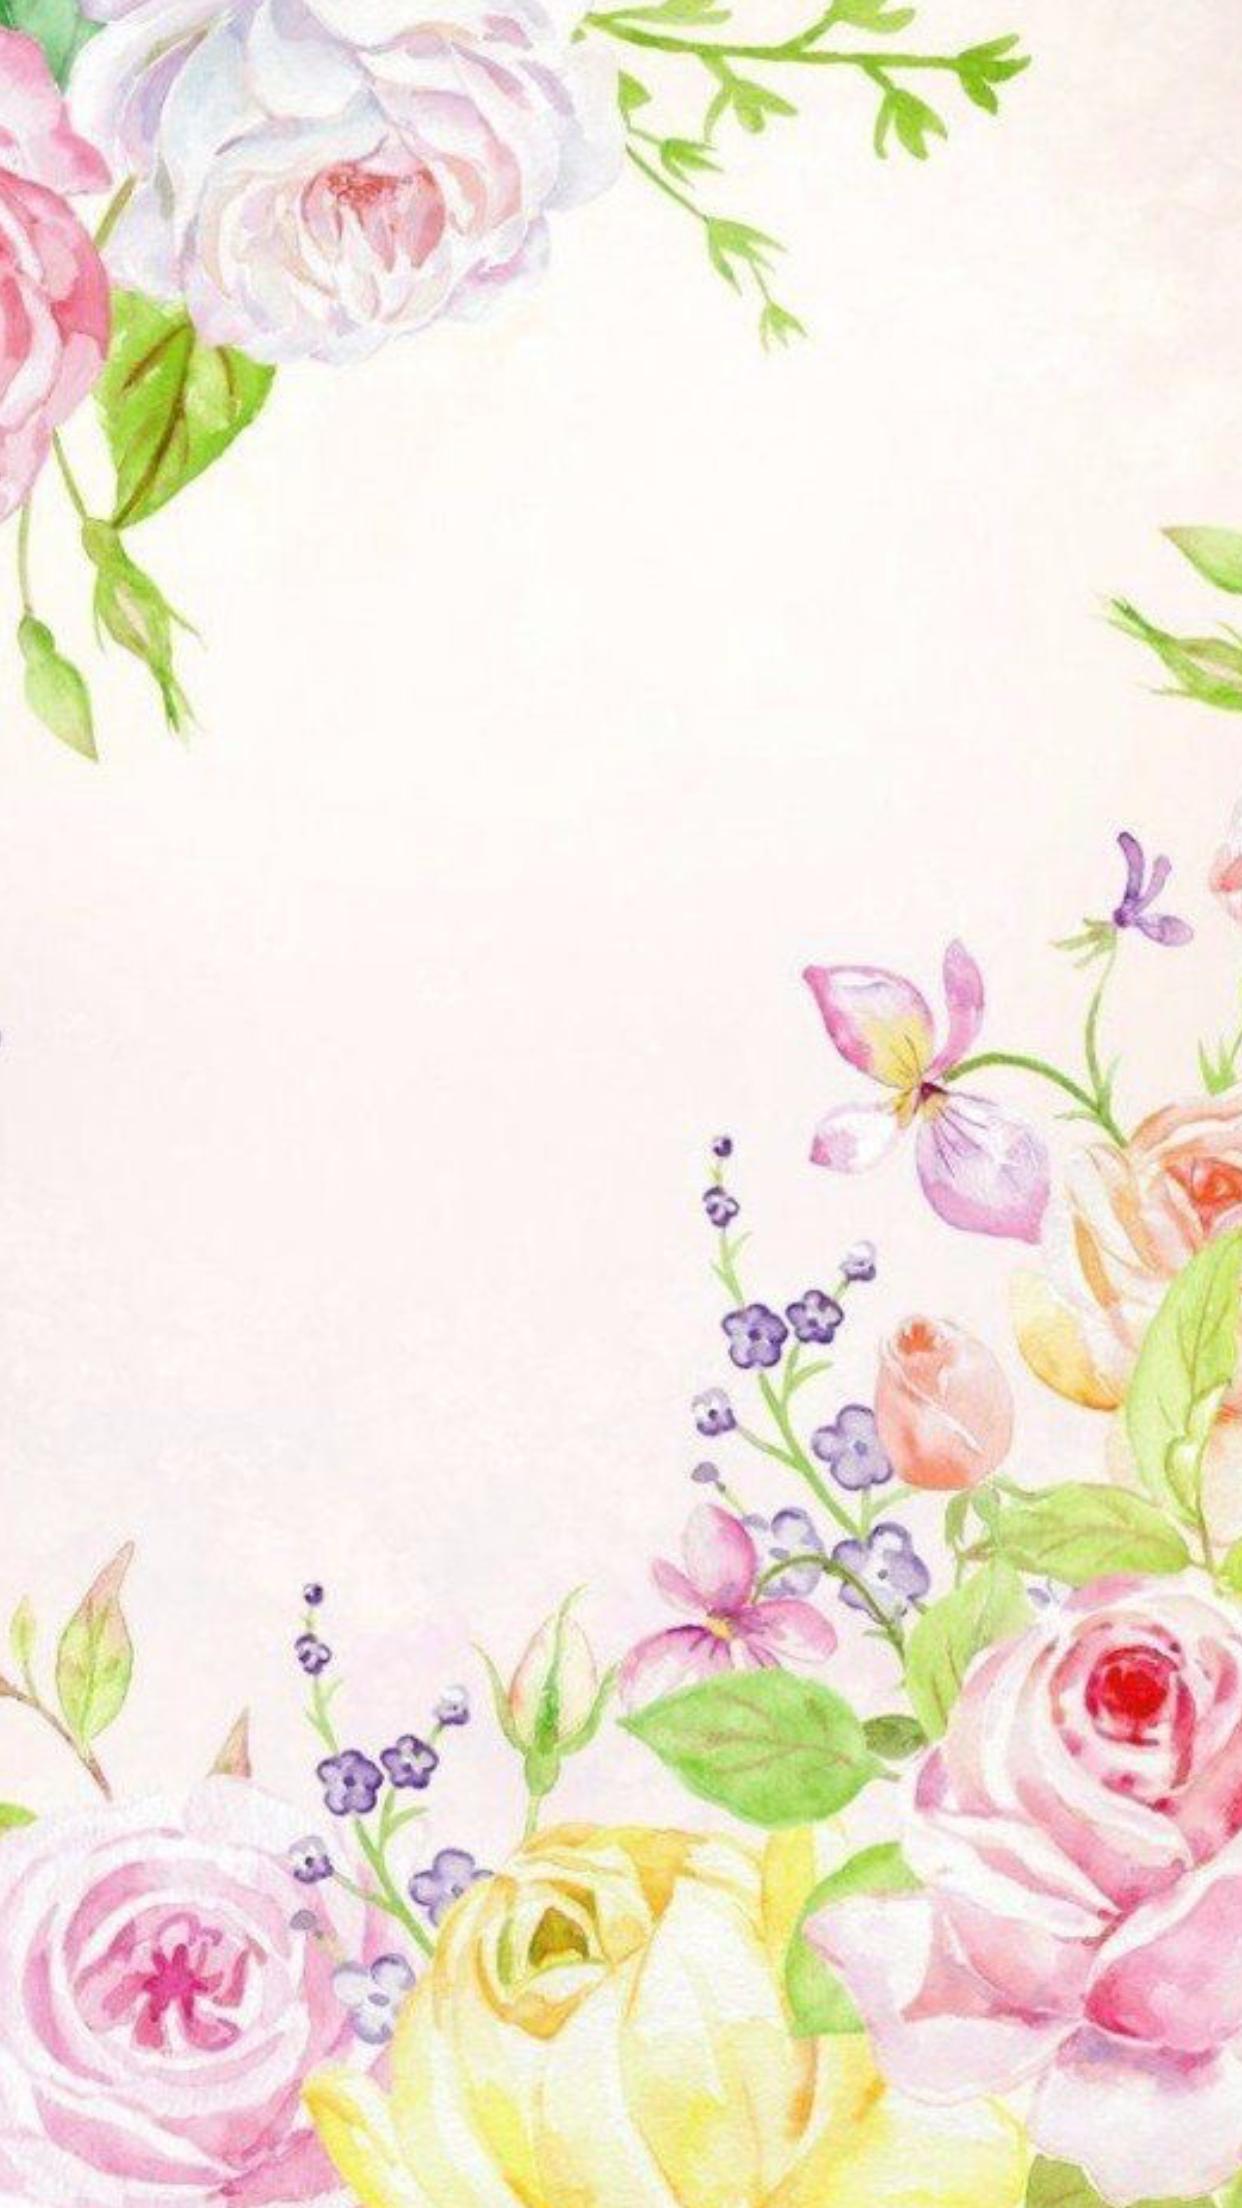 Pin By Hina Rizwan On Wallpapers Pinterest Wallpaper Wallpaper